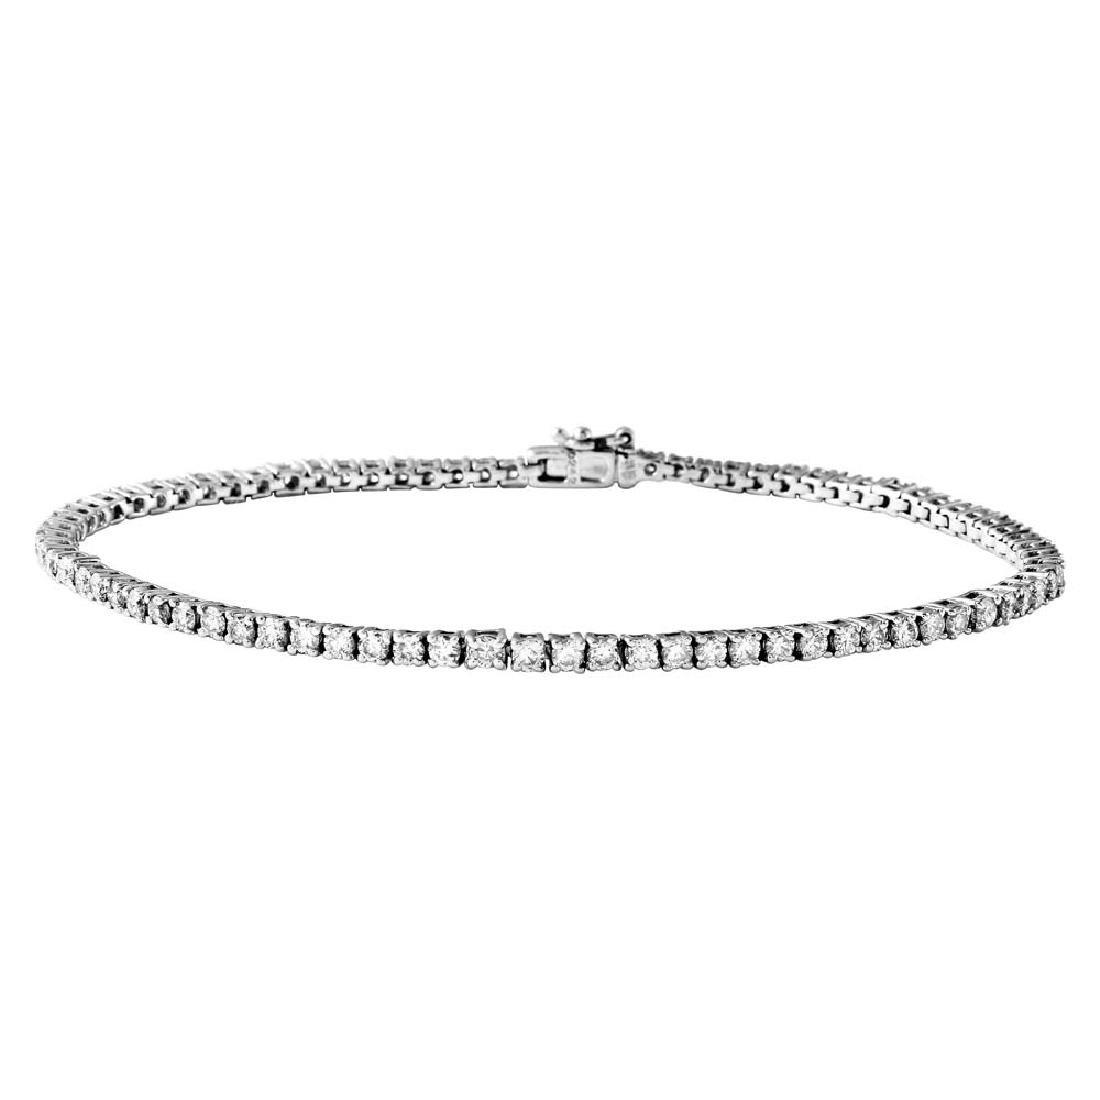 Genuine 2.42 TCW 18K White Gold Ladies Bracelet